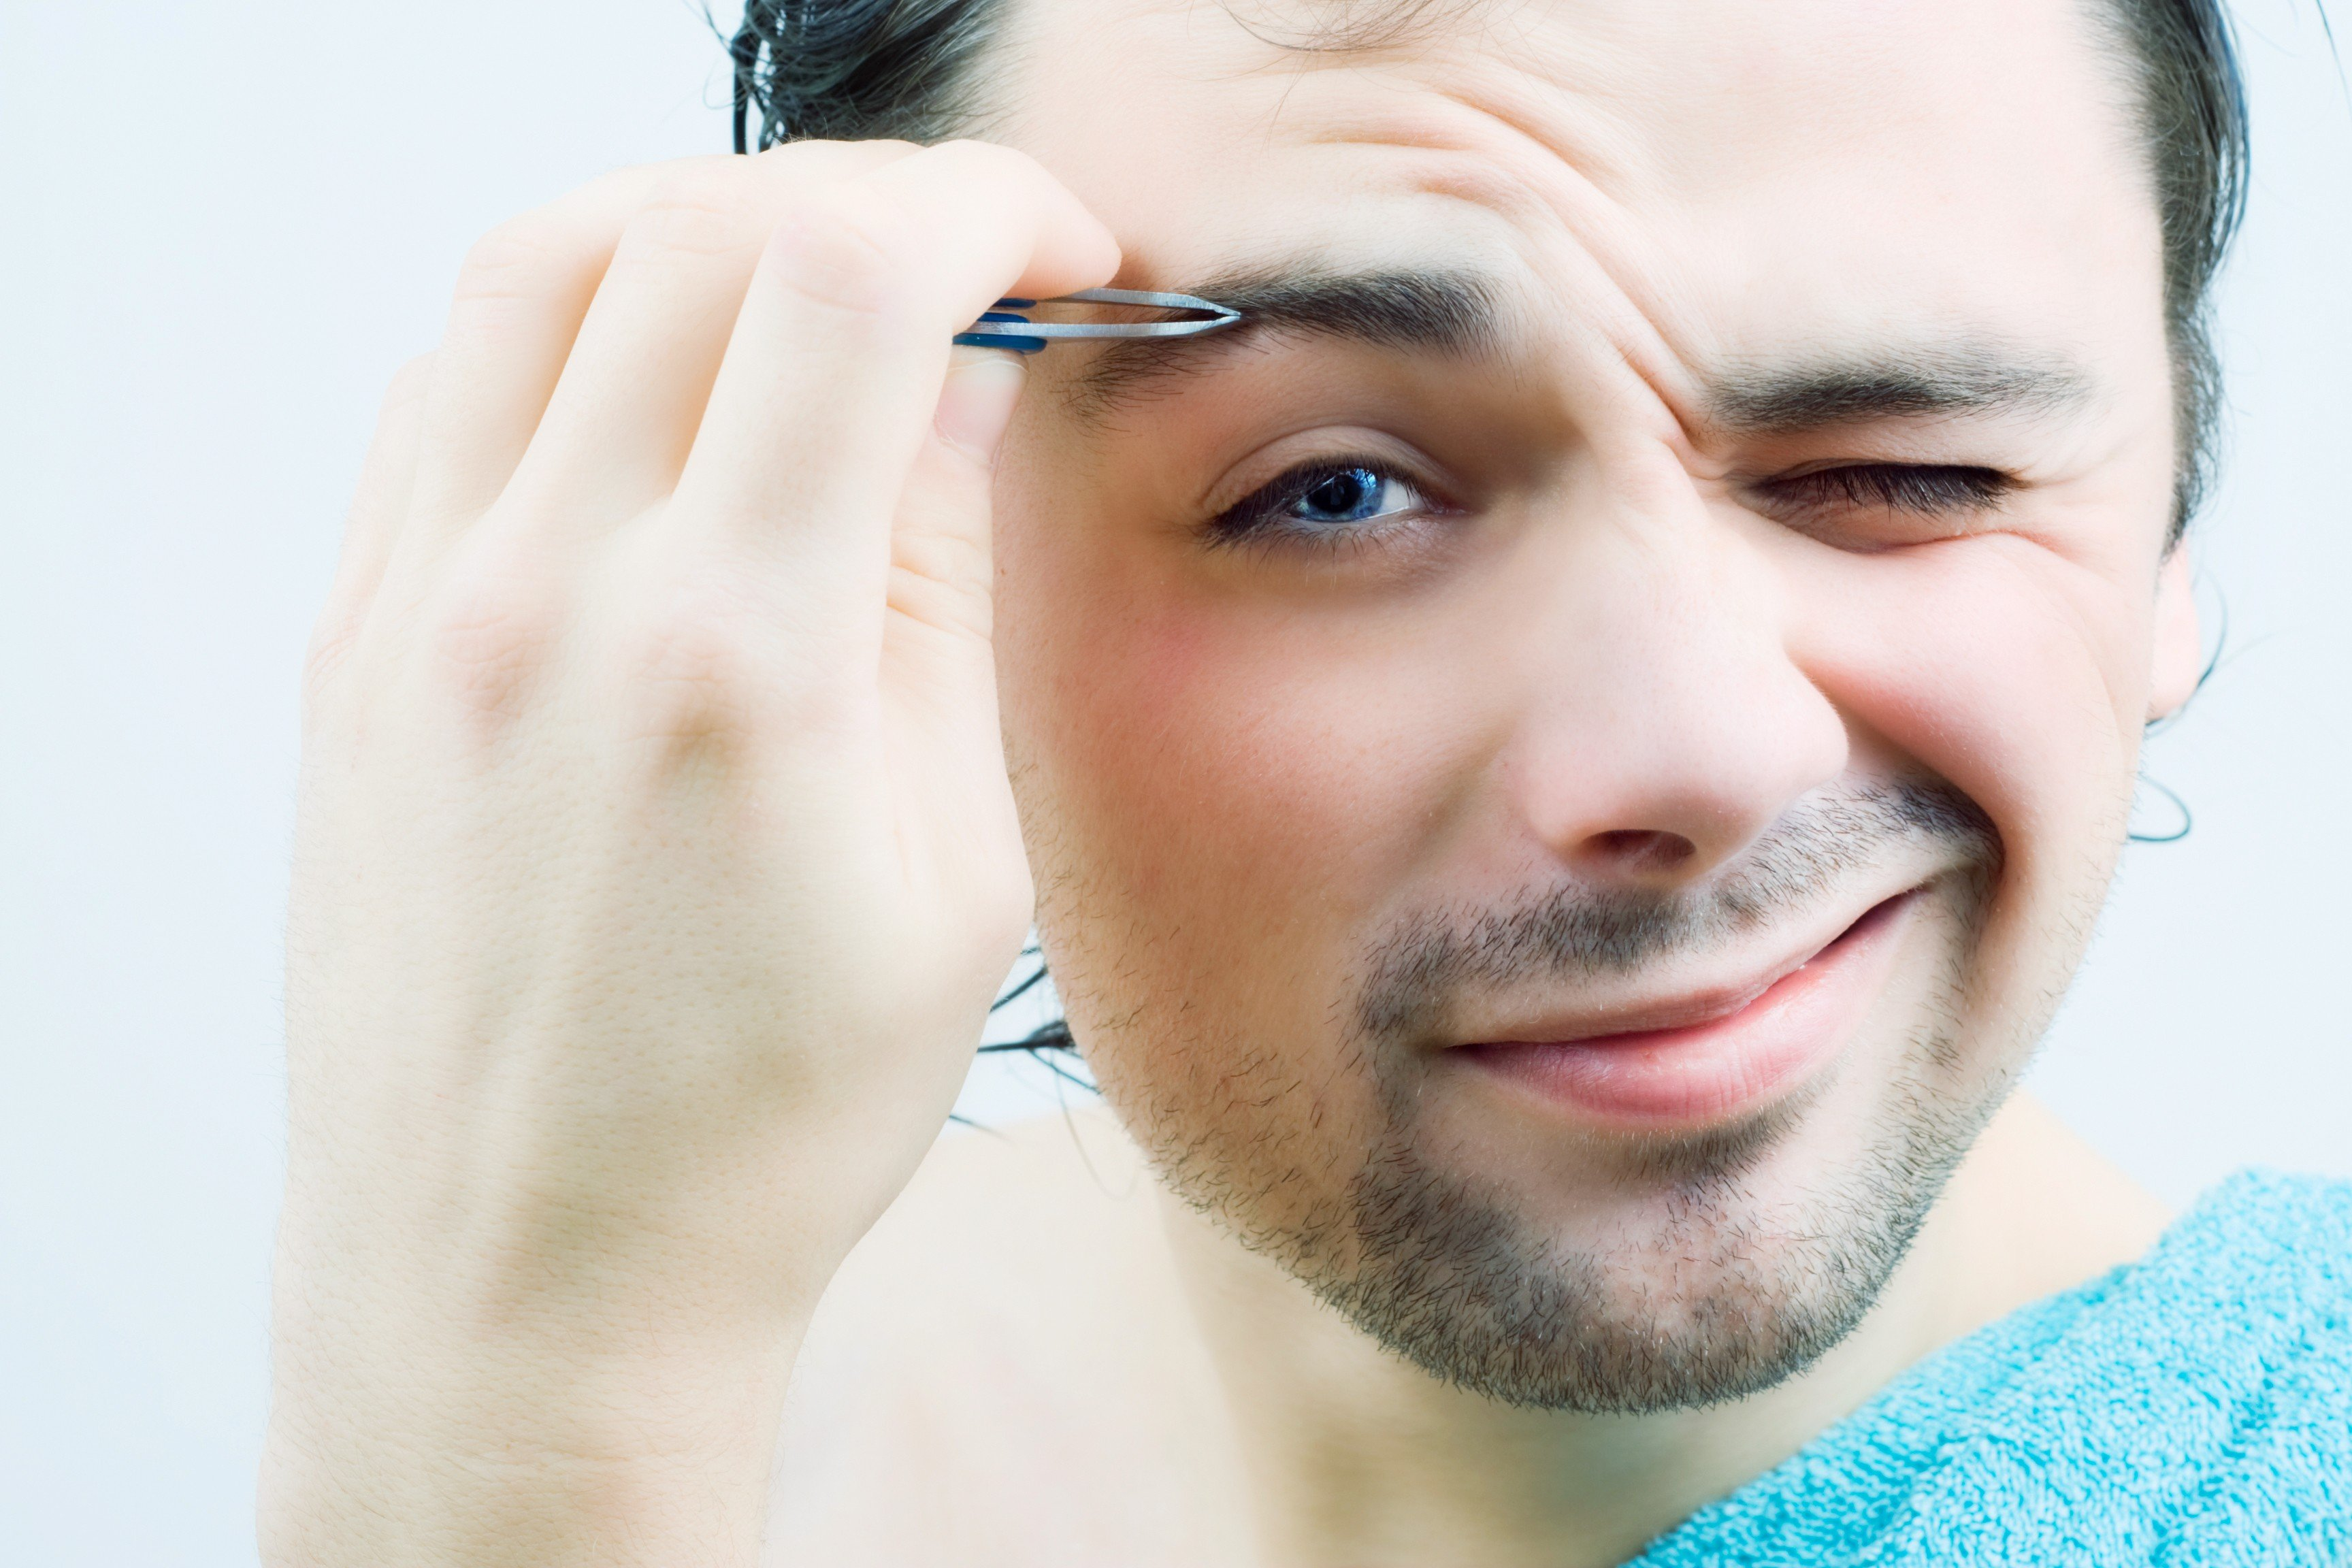 Don't Tweeze - Eyebrow Plucking - B2B Eyebrow Sculpting